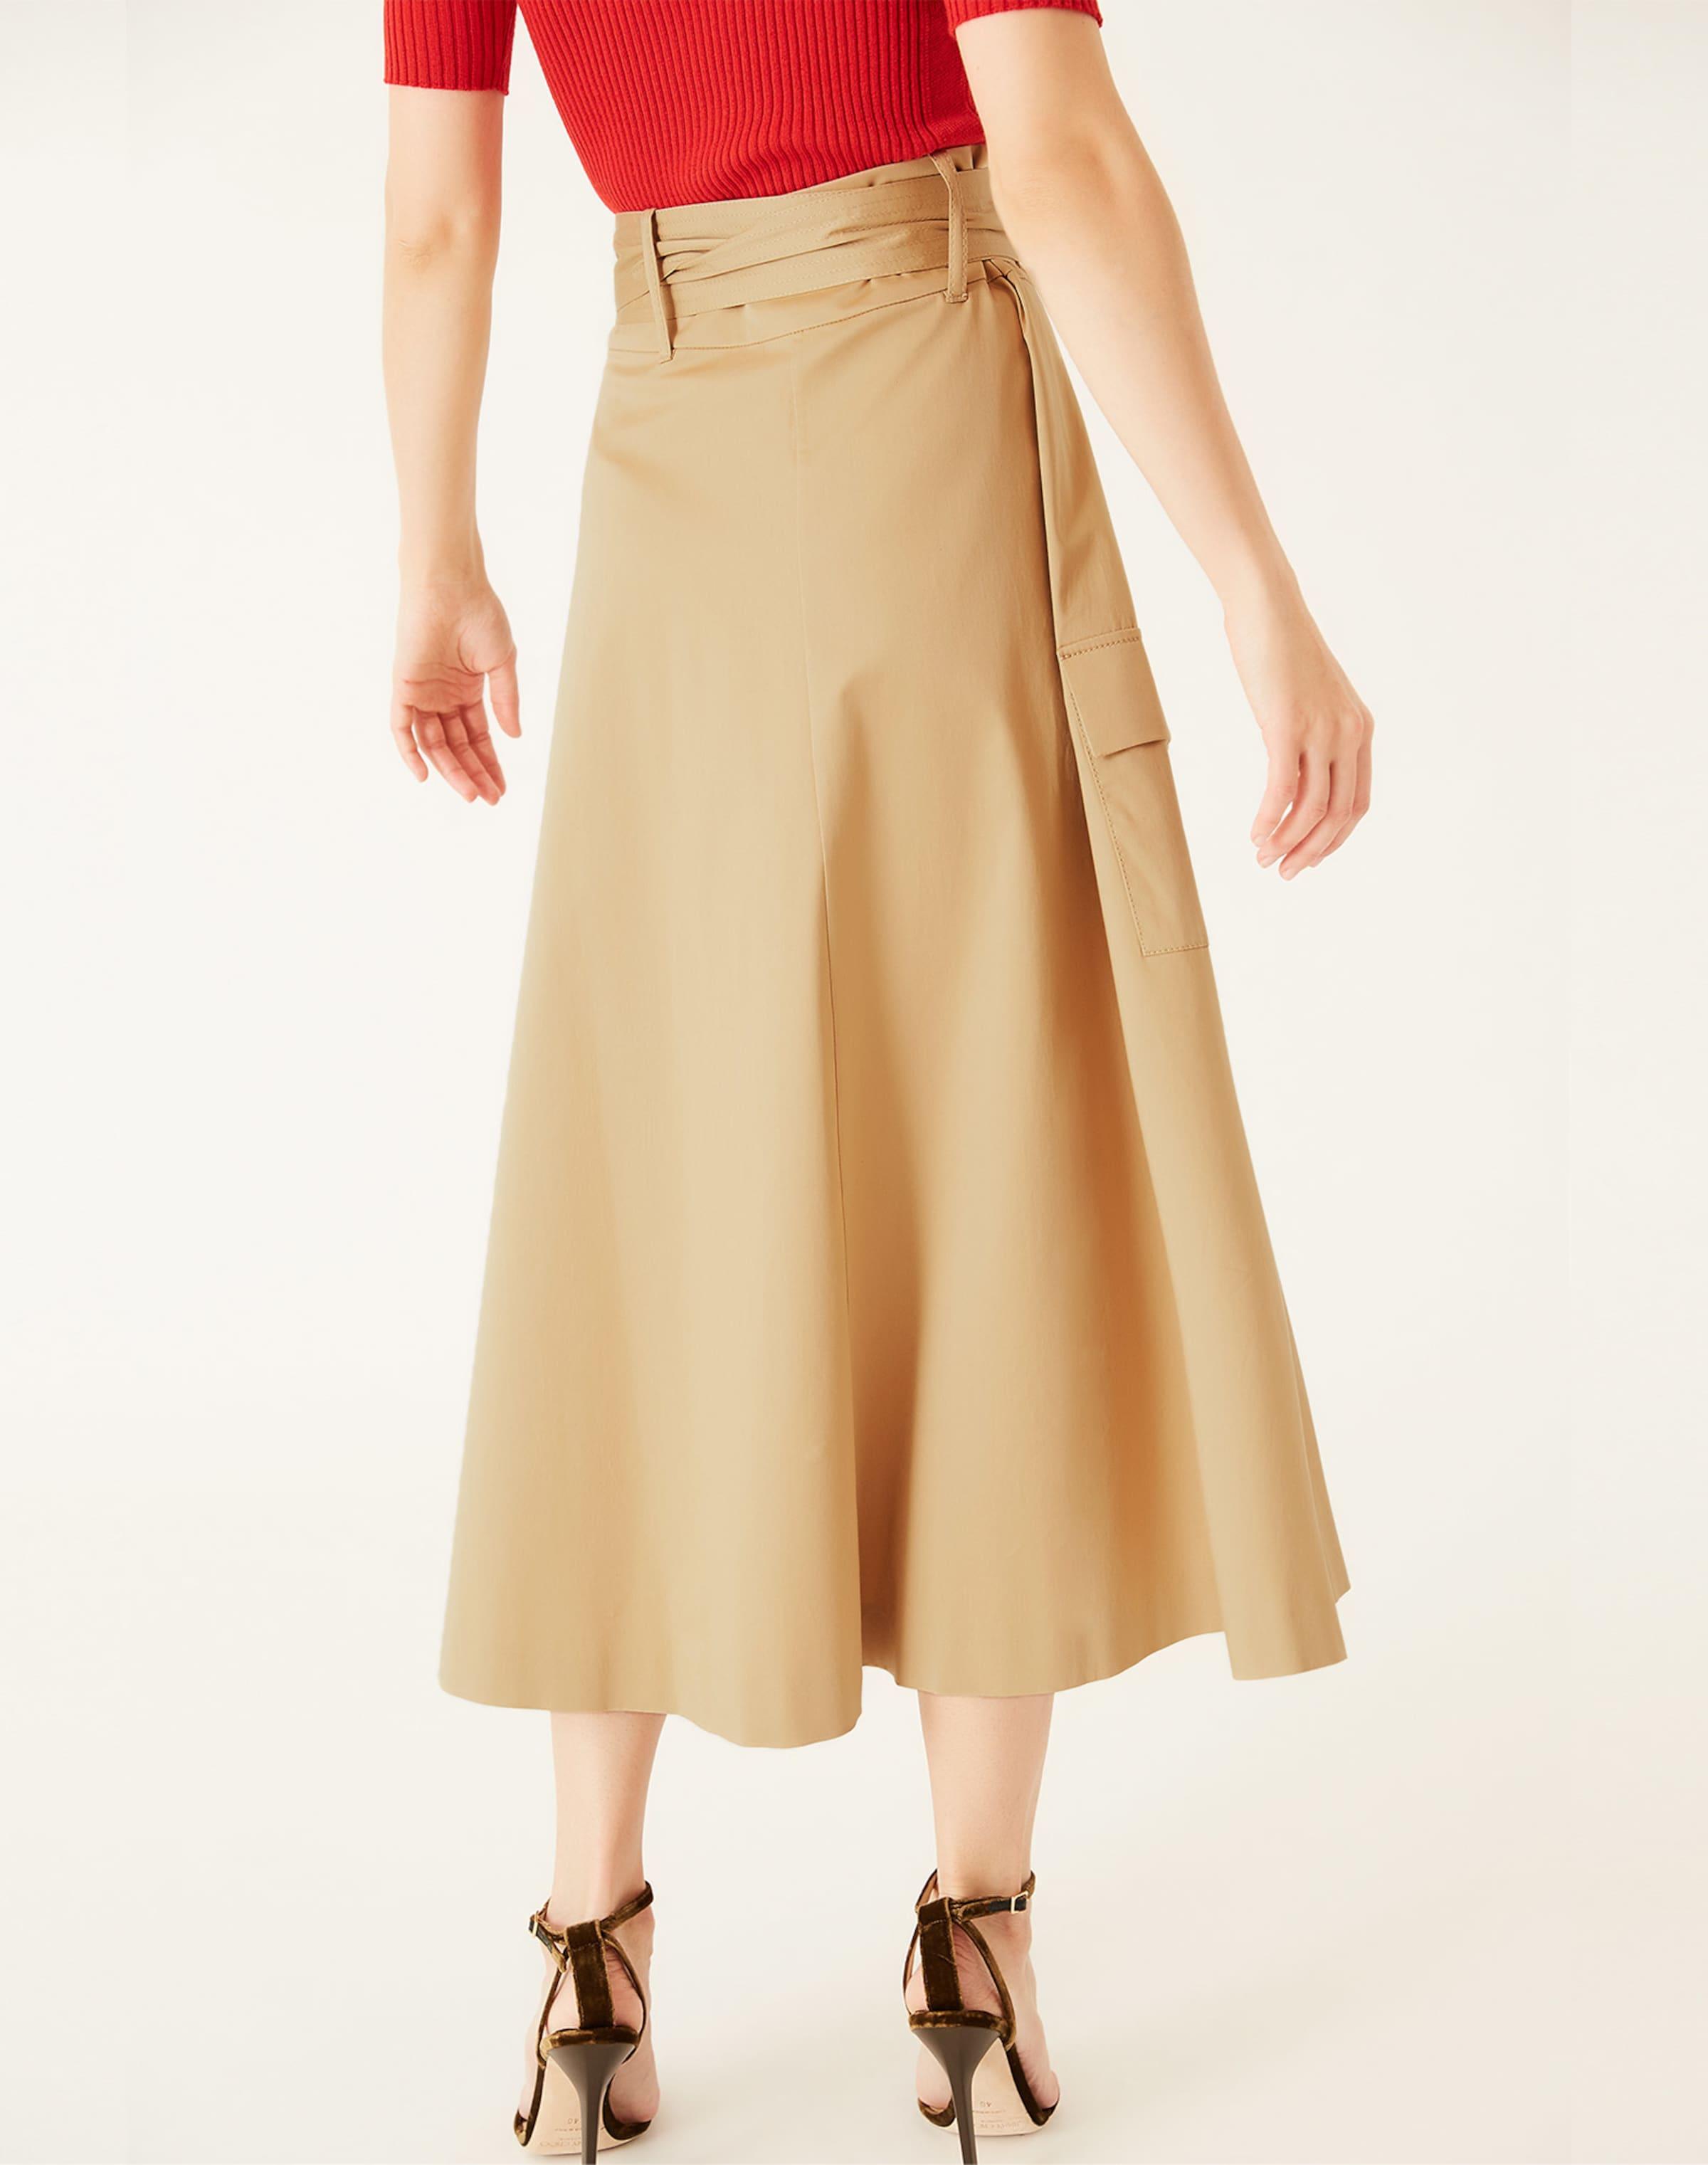 Ivyamp; In Oak Skirt Skirt Honig In Oak Ivyamp; LVGqzjSUMp